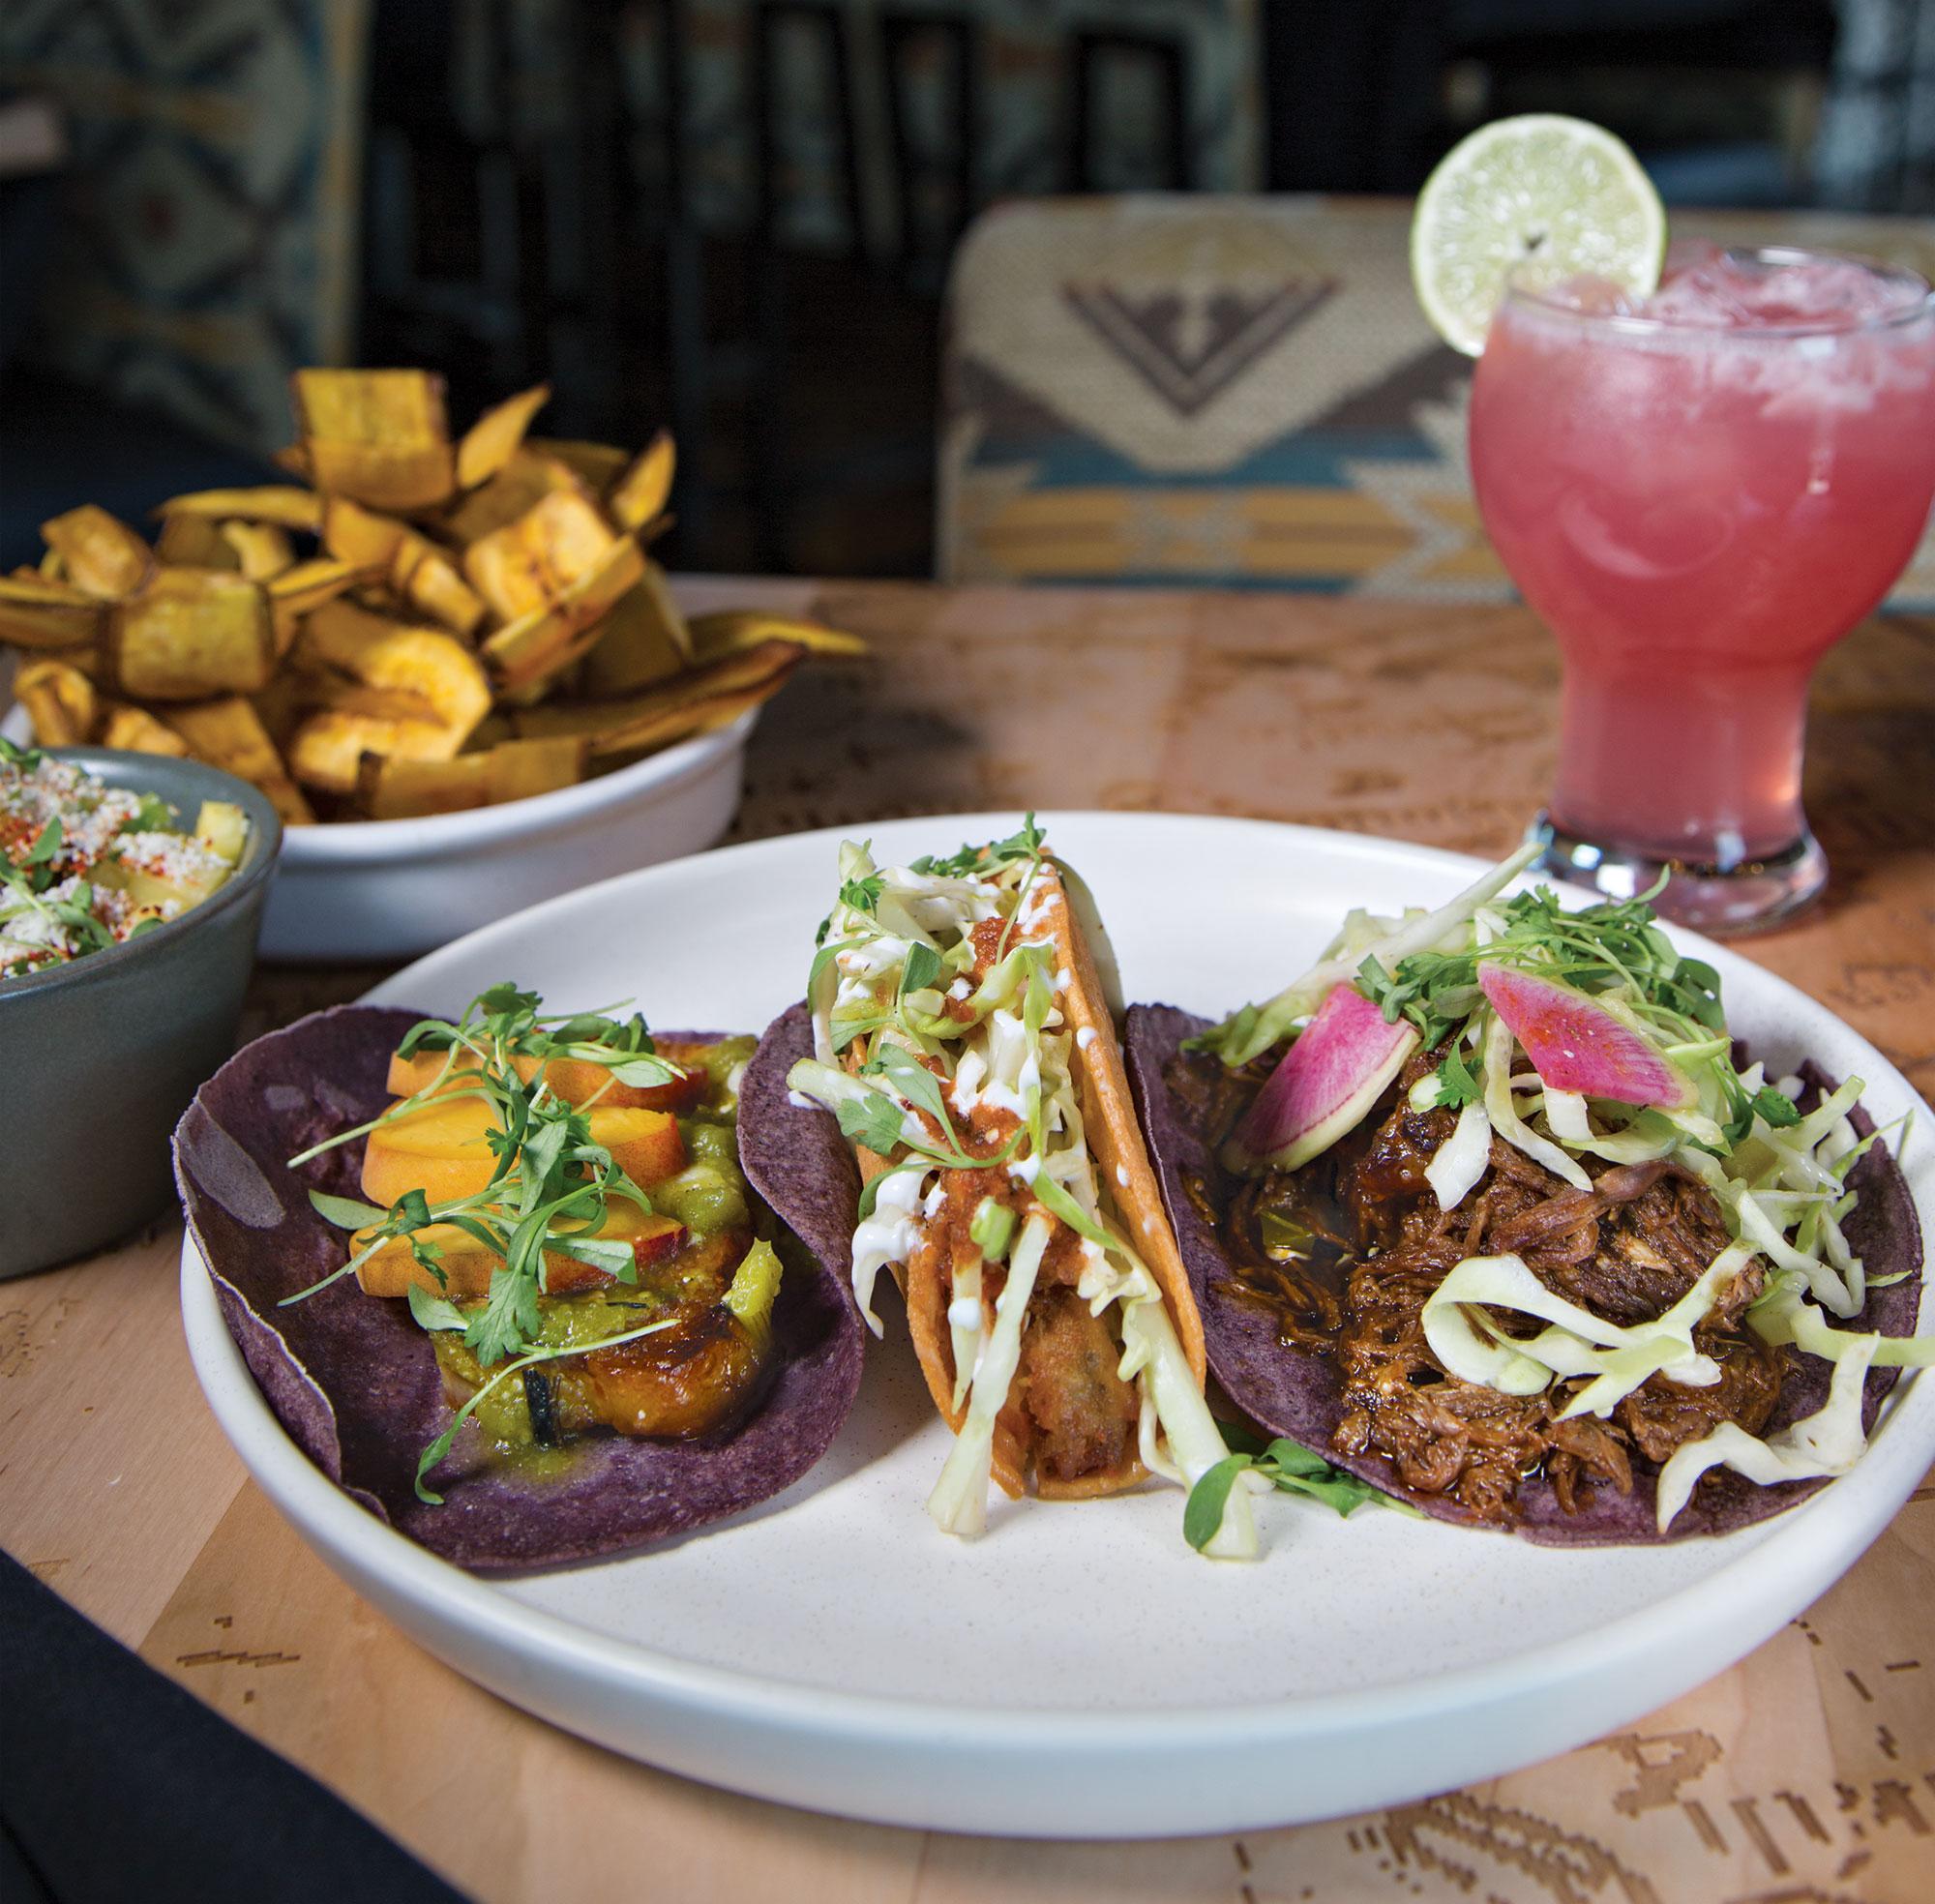 Short rib, potato and carnitas tacos, guacamole with plantains and prickly pear paloma; Photography by Angelina Aragon